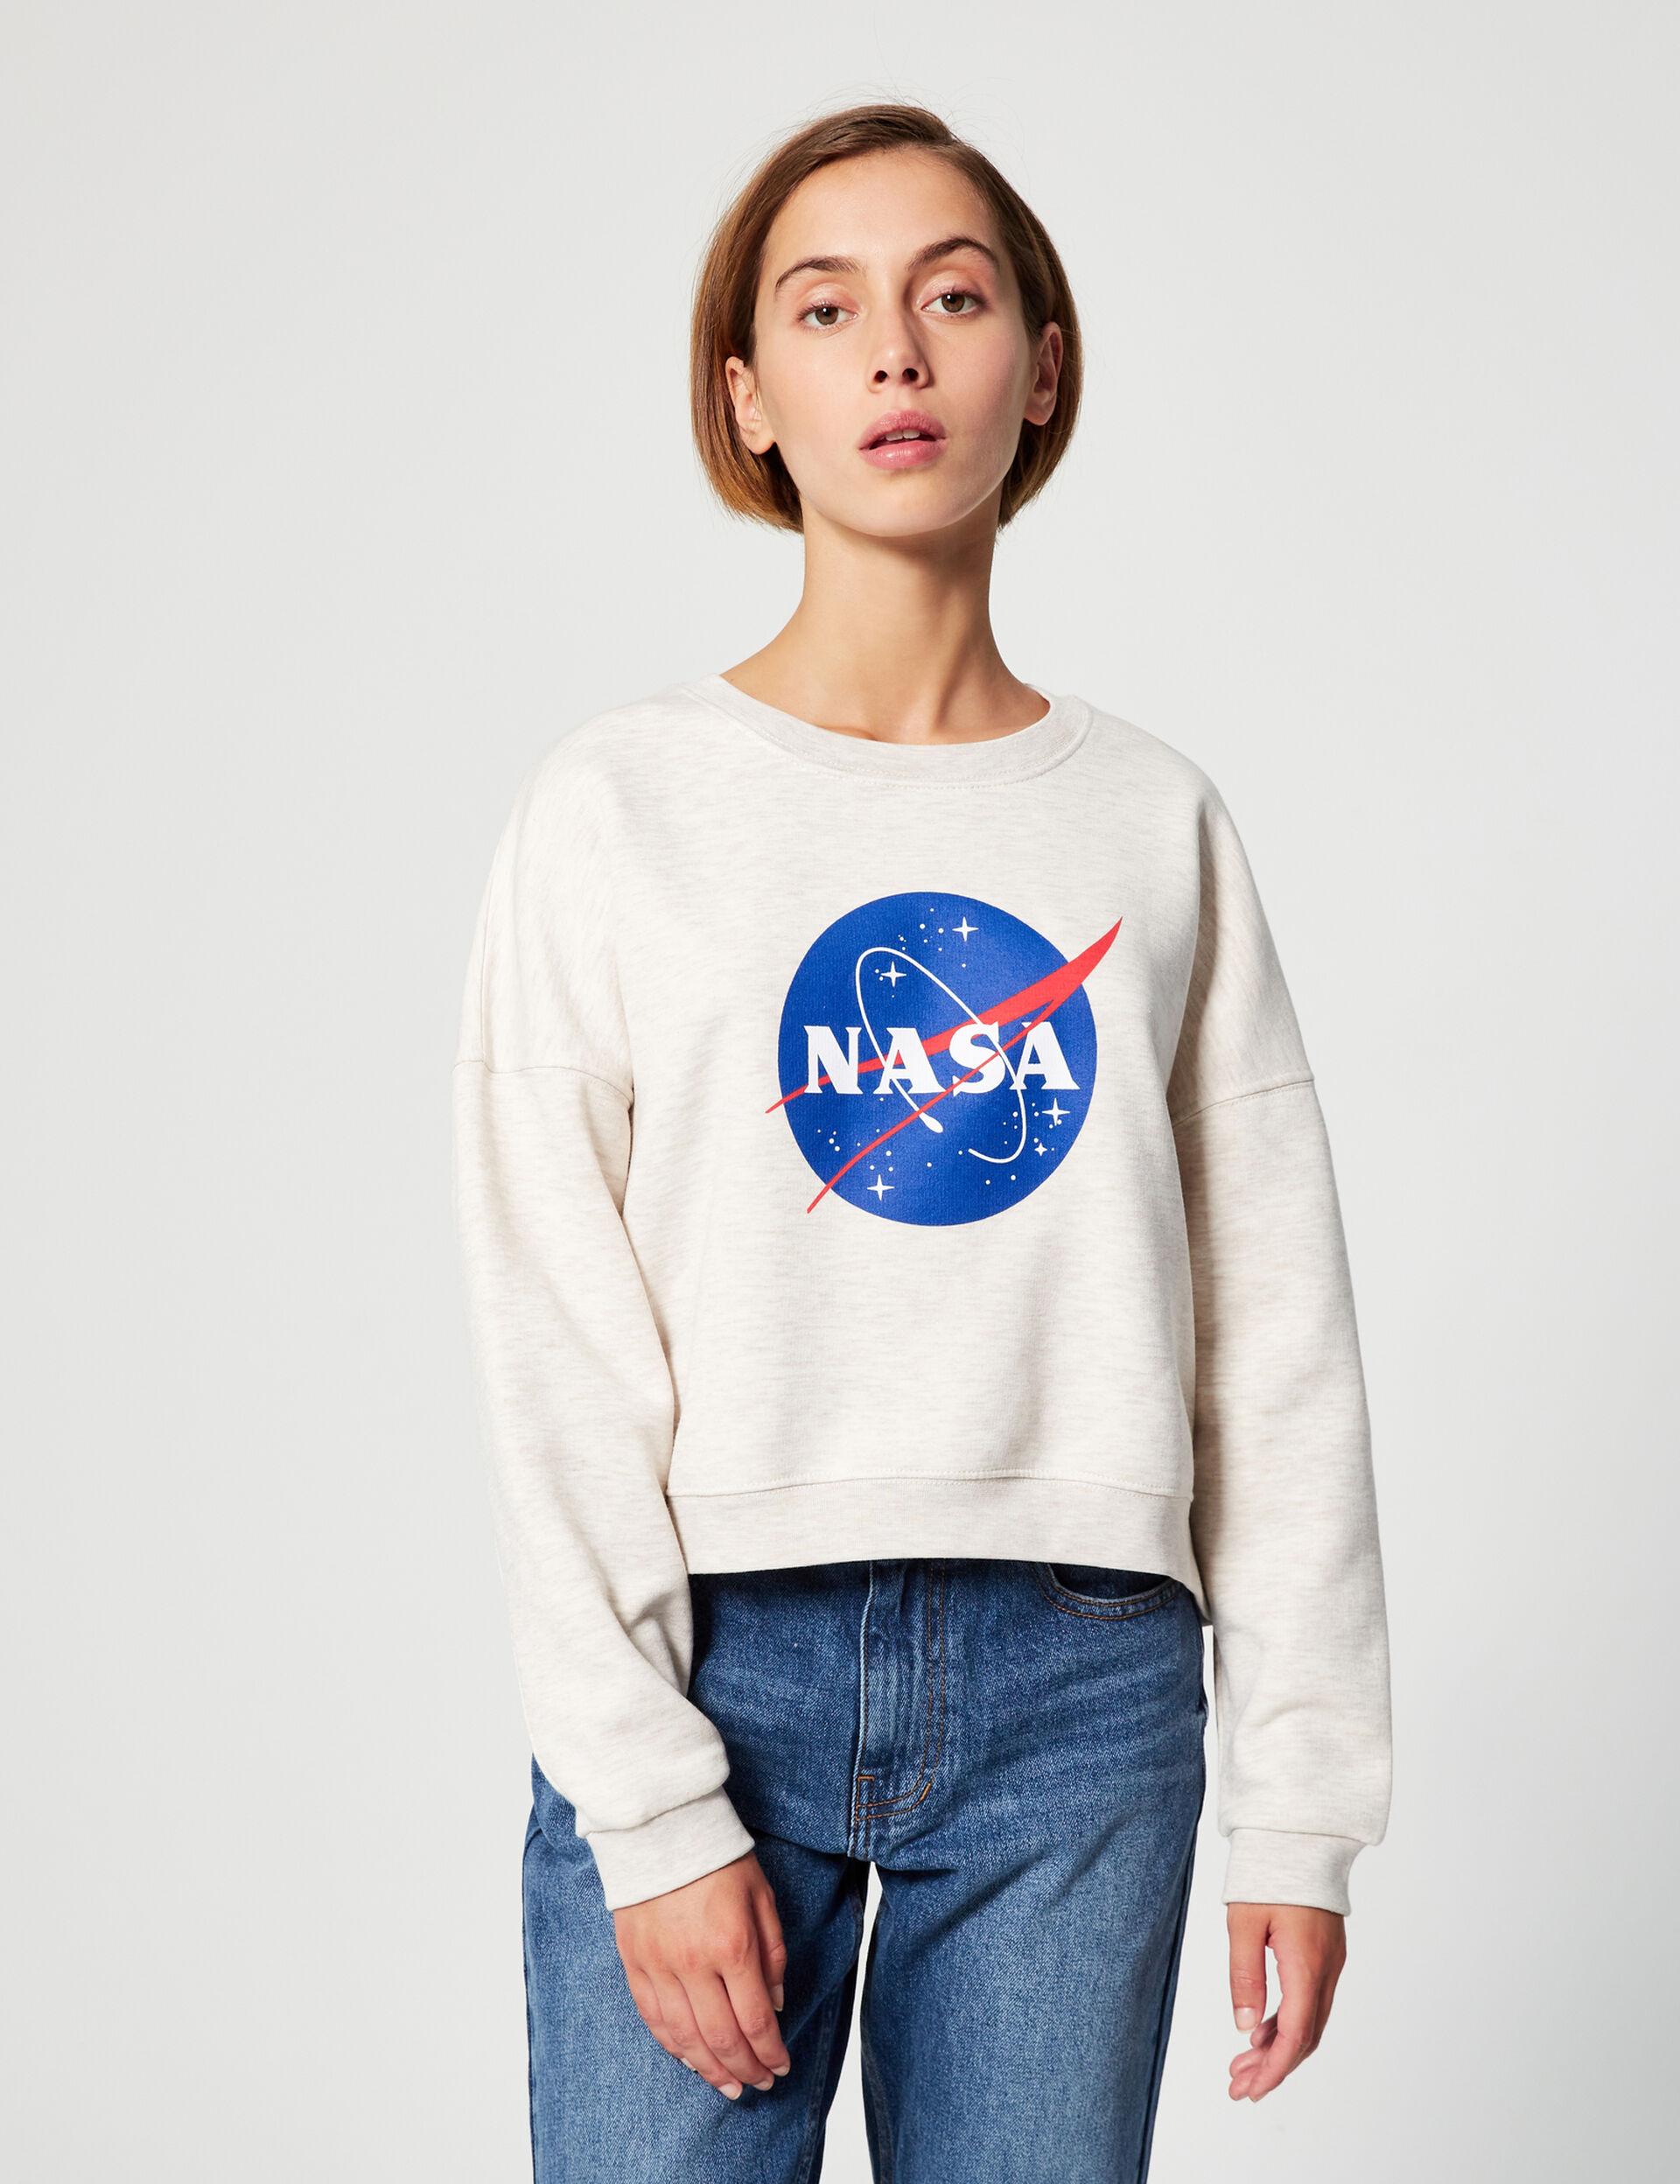 NASA sweatshirt